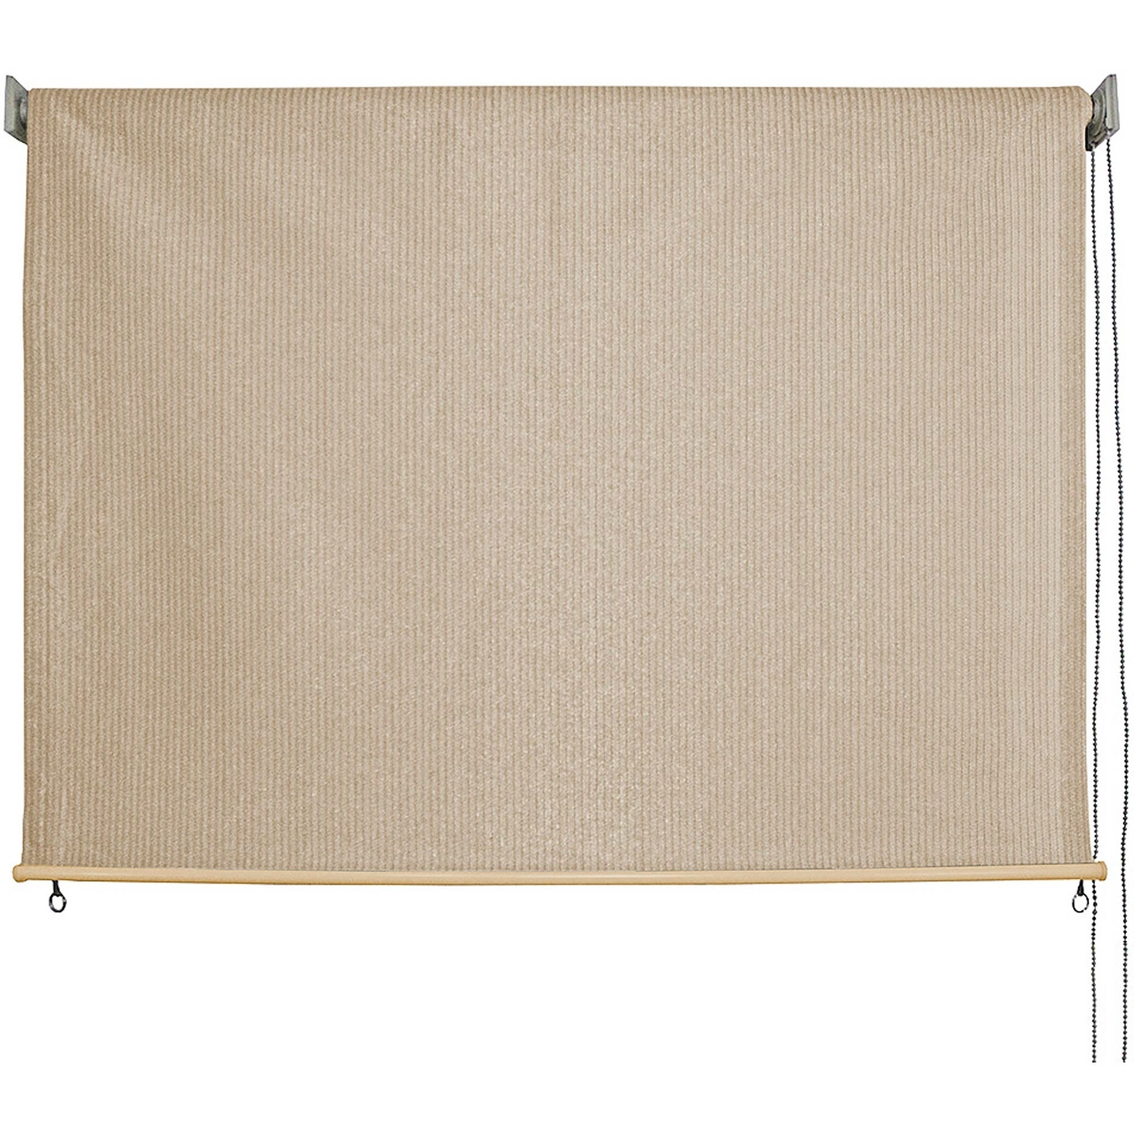 Keystone Fabrics Outdoor Roller Sun Shade Table Umbrellas Shades More Shop The Exchange